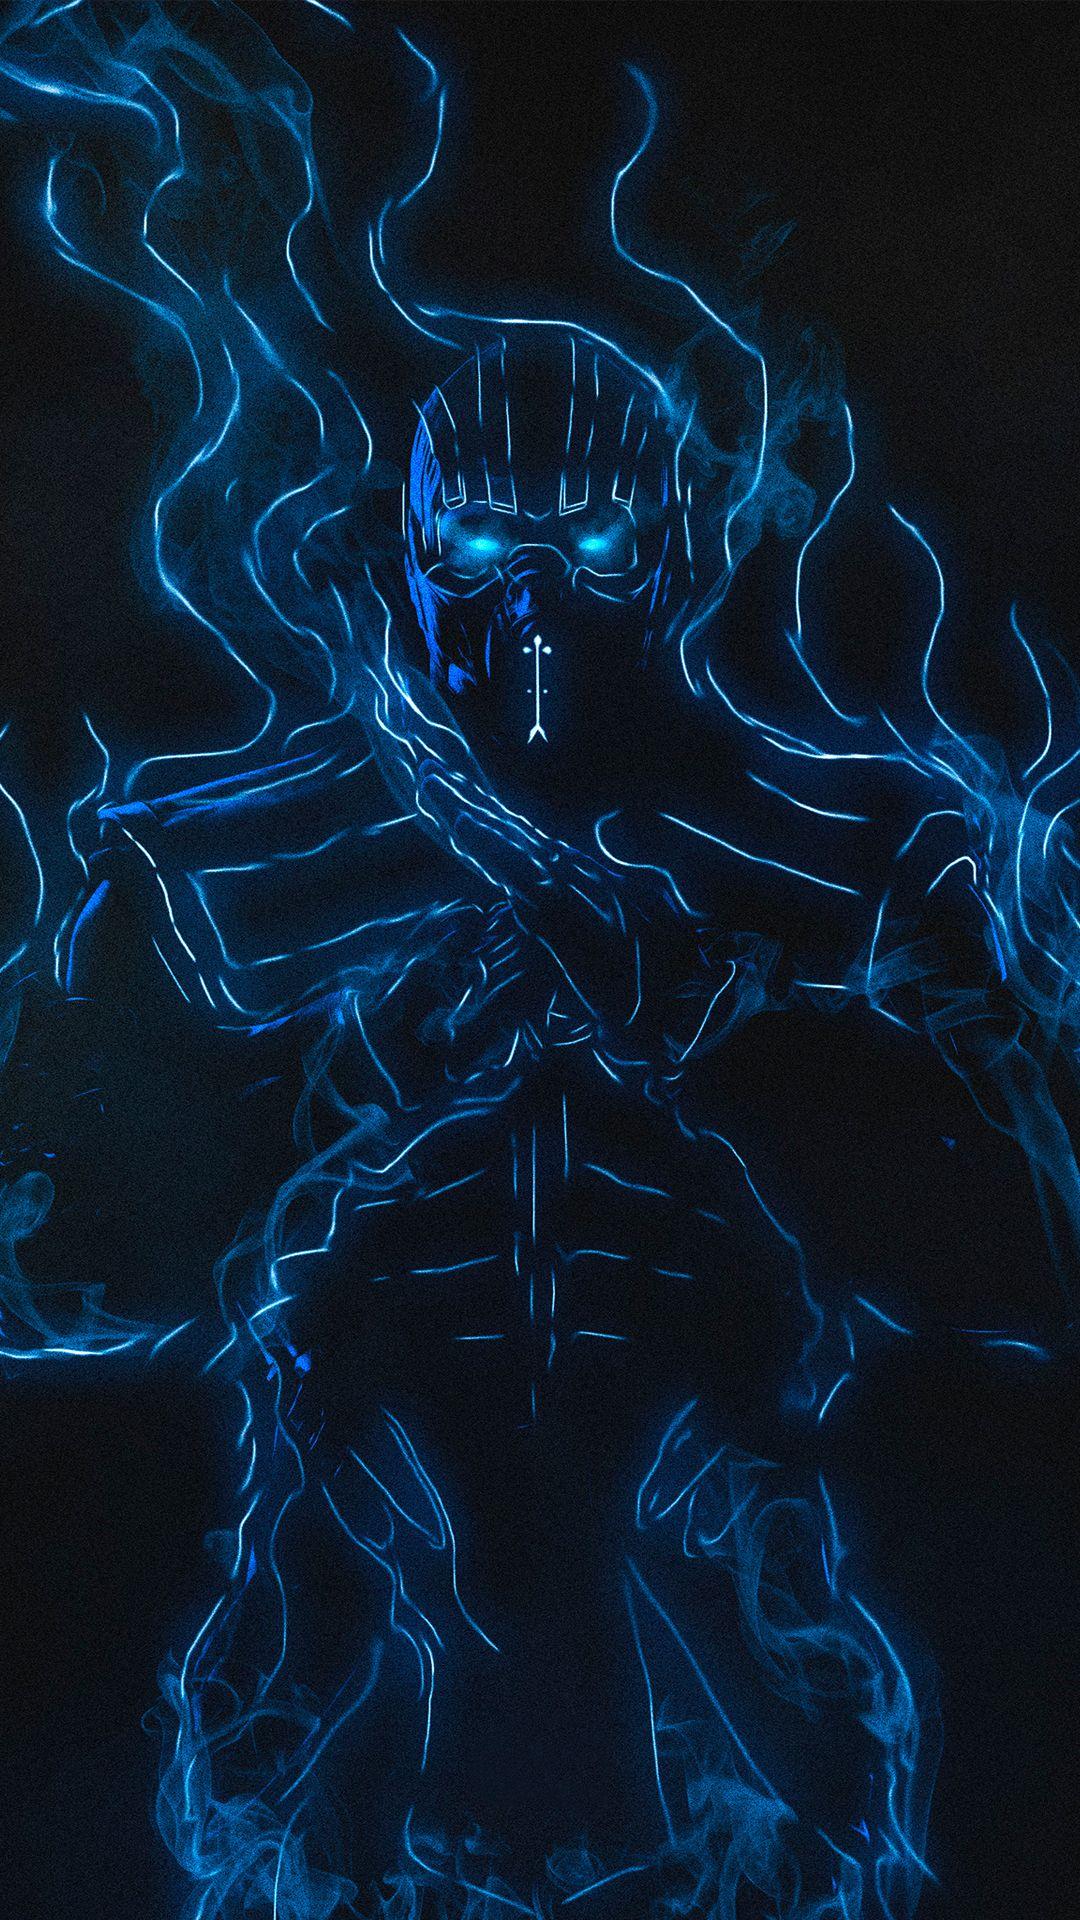 Pin By Josephs On Mk Mortal Kombat Art Sub Zero Mortal Kombat Mortal Kombat Characters